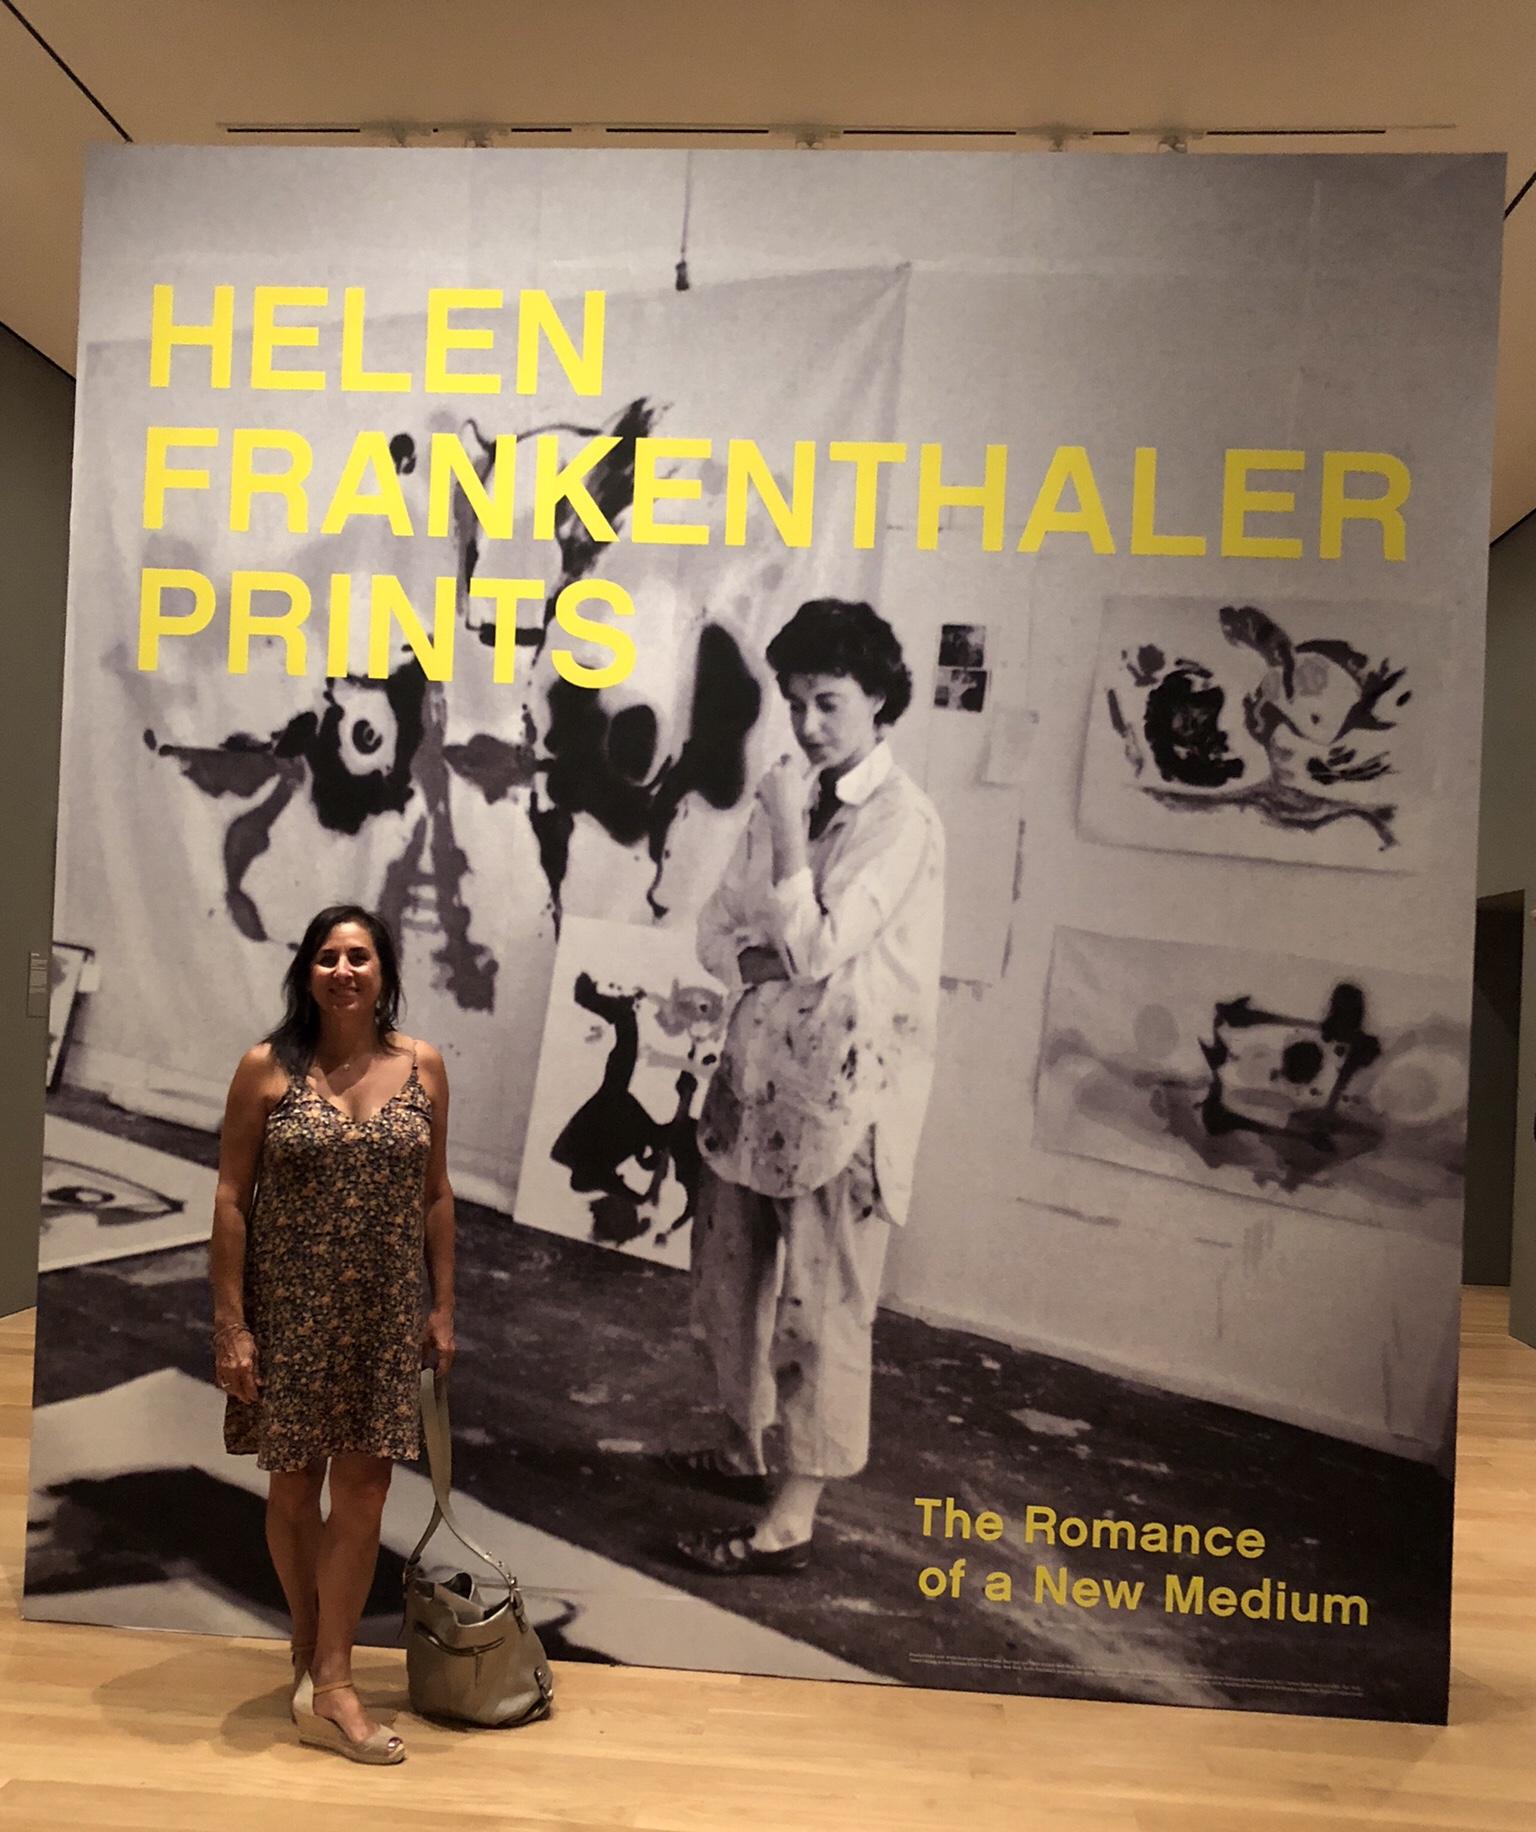 Helen Frankenthaler Print exhibit